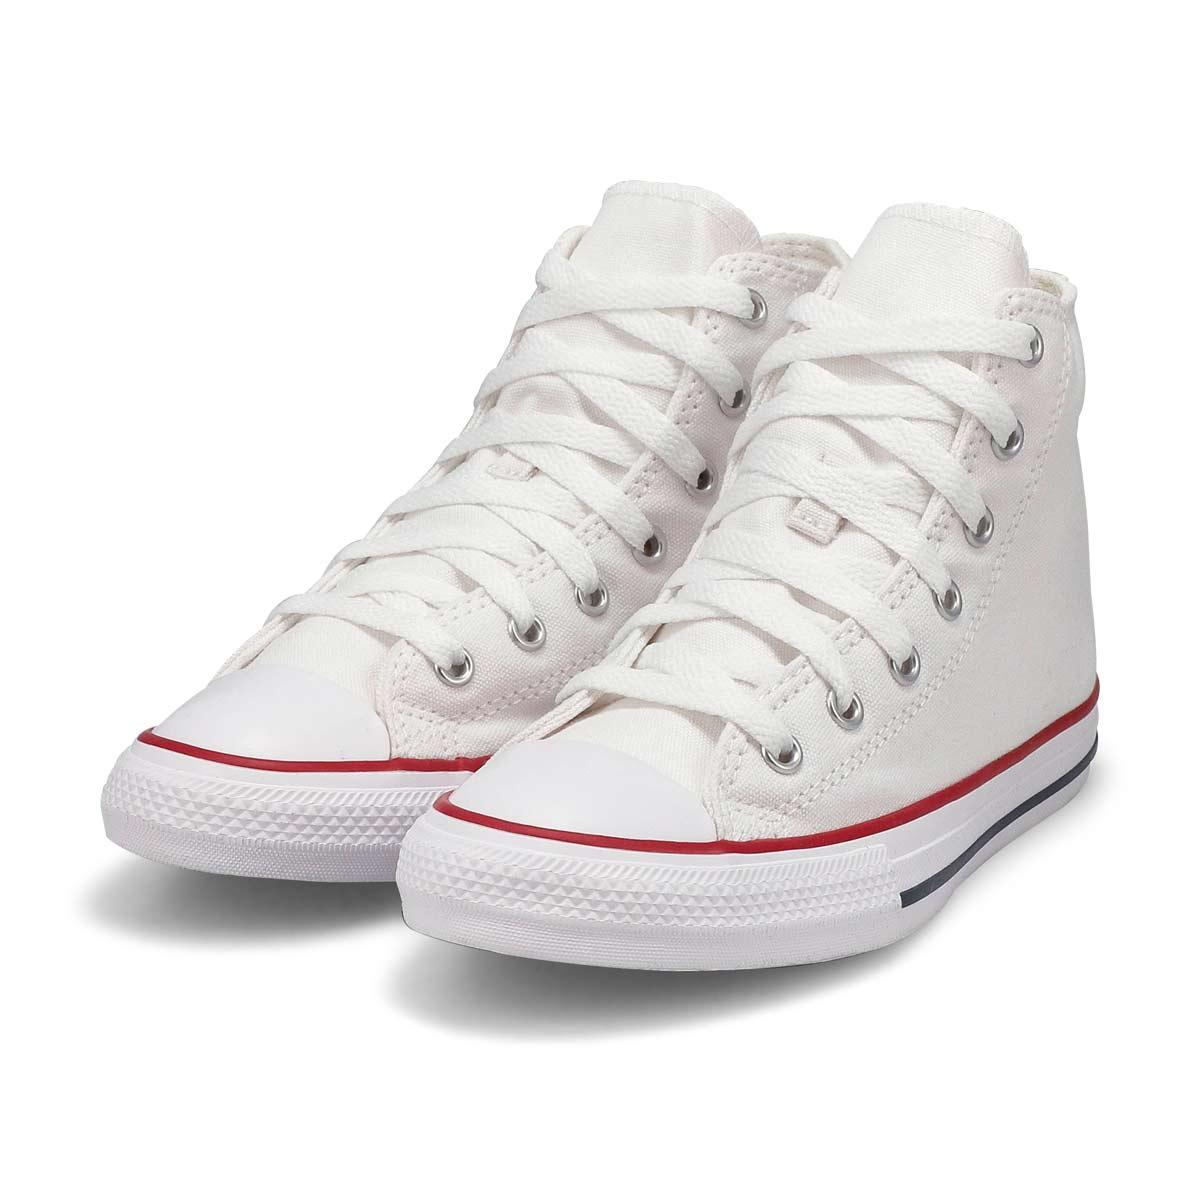 Kids' Chuck Taylor All Star Hi Top Sneaker - Wht